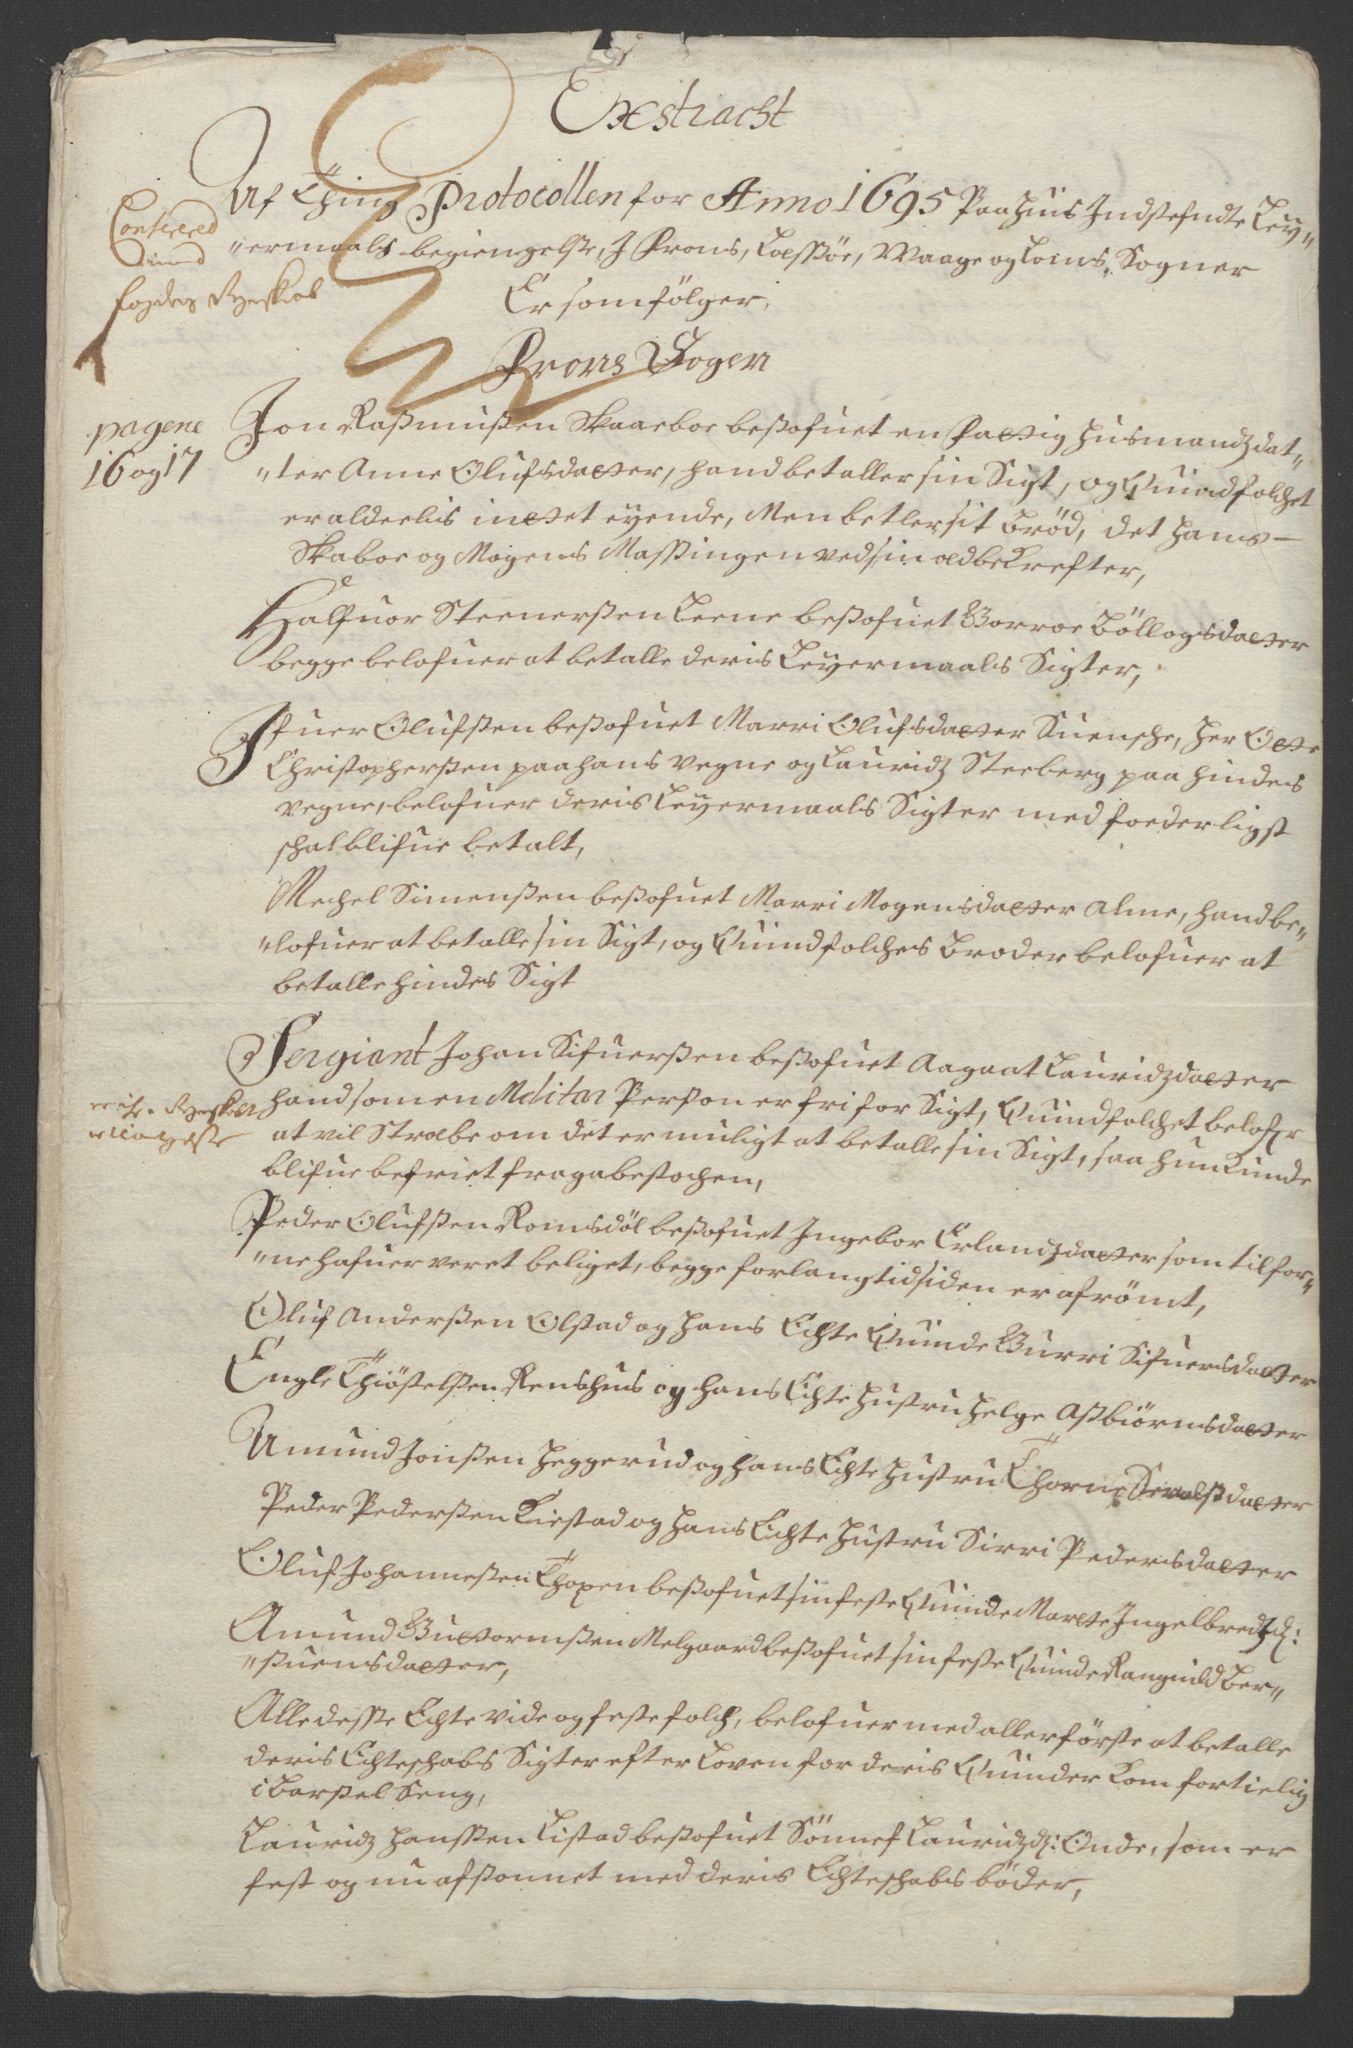 RA, Rentekammeret inntil 1814, Reviderte regnskaper, Fogderegnskap, R17/L1169: Fogderegnskap Gudbrandsdal, 1695, s. 32